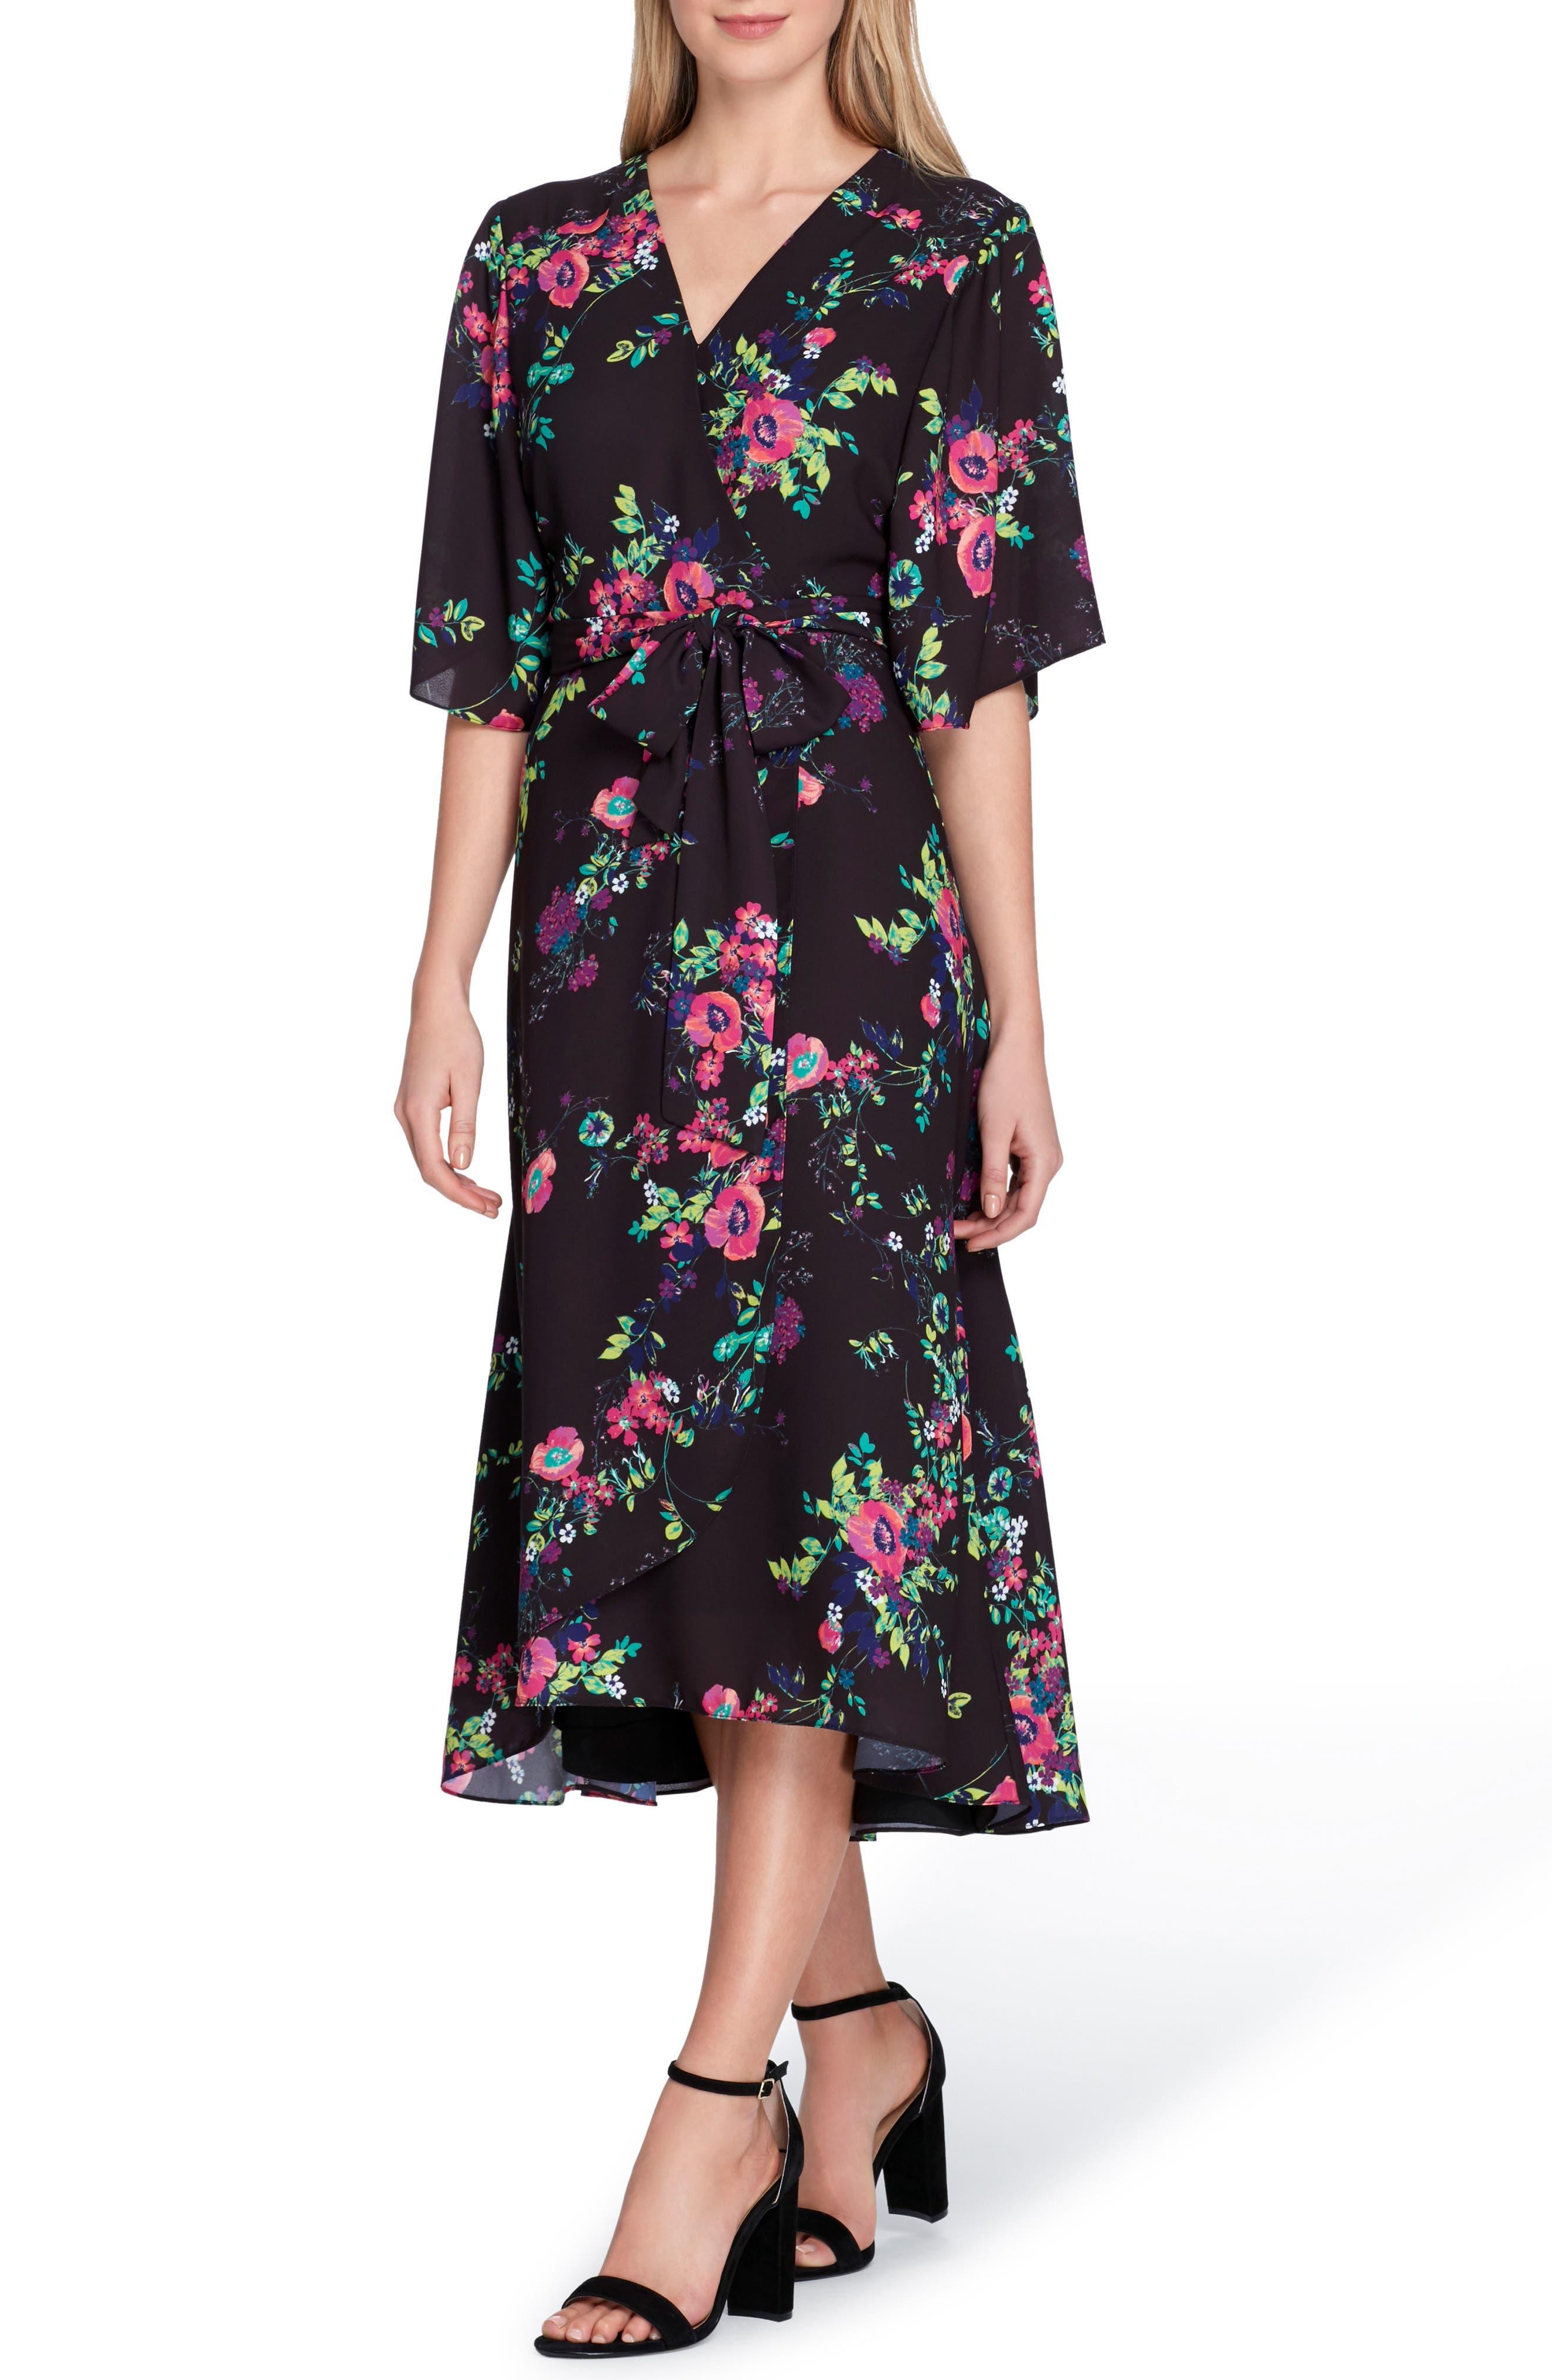 Floral Faux Wrap Midi Dress,                             Main thumbnail 1, color,                             Black/ Fuchsia/ Green